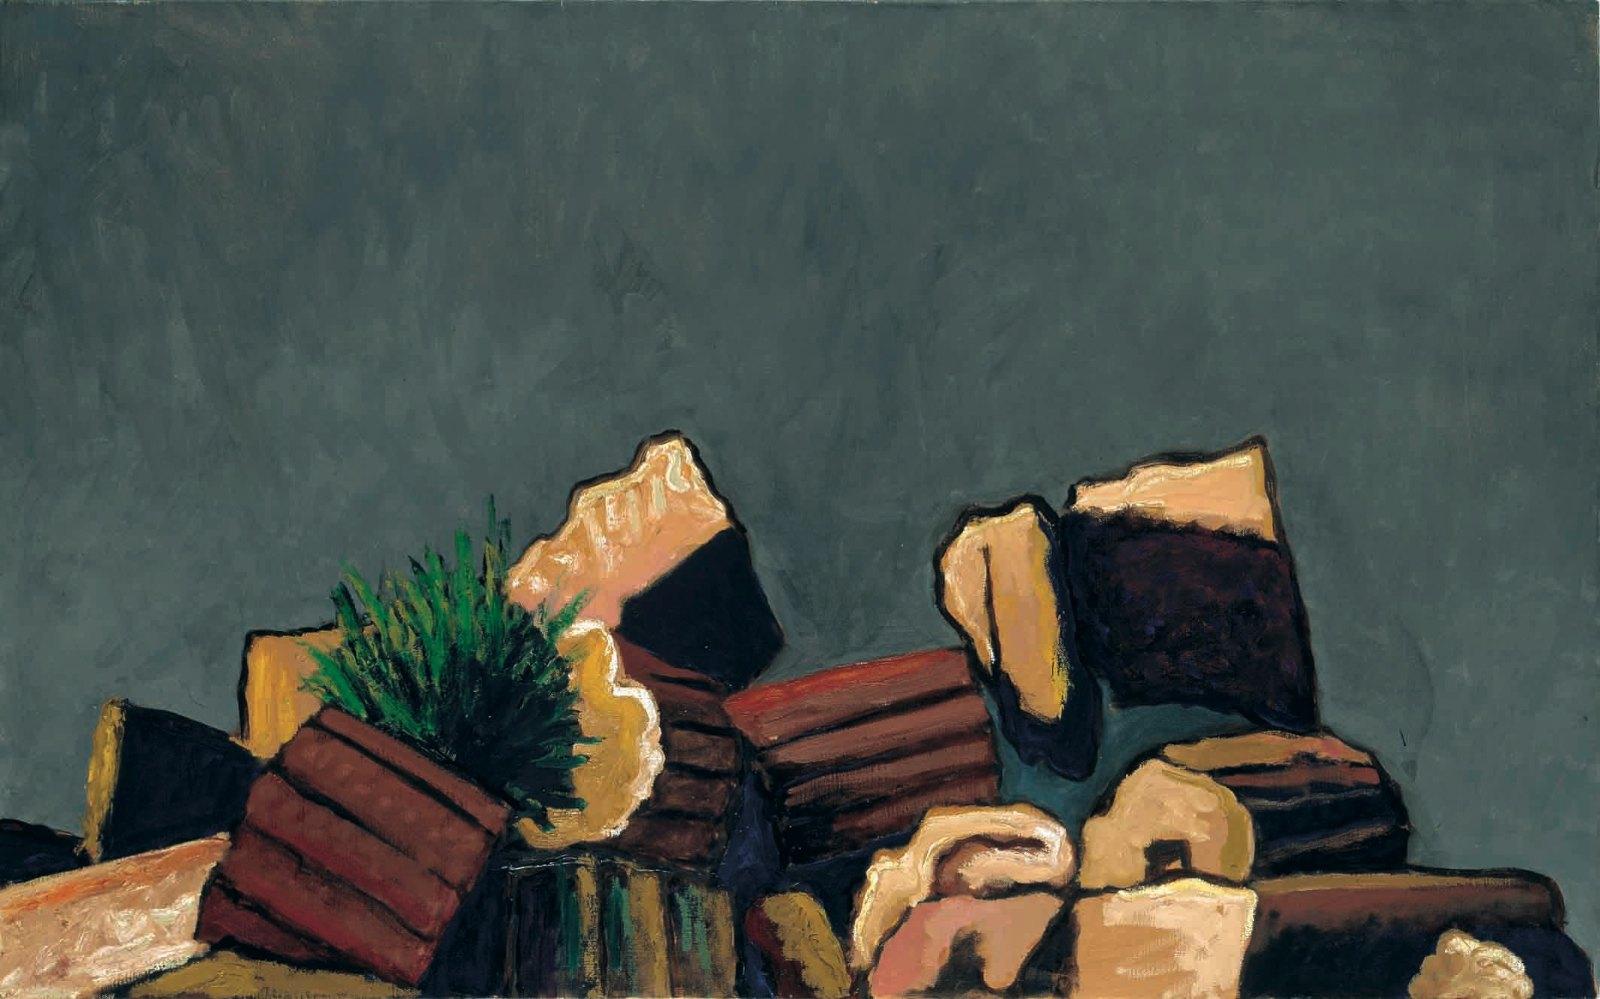 Paul Osipow, Greek Ruin I, 2004, Oil on canvas, 81 x 130 cm